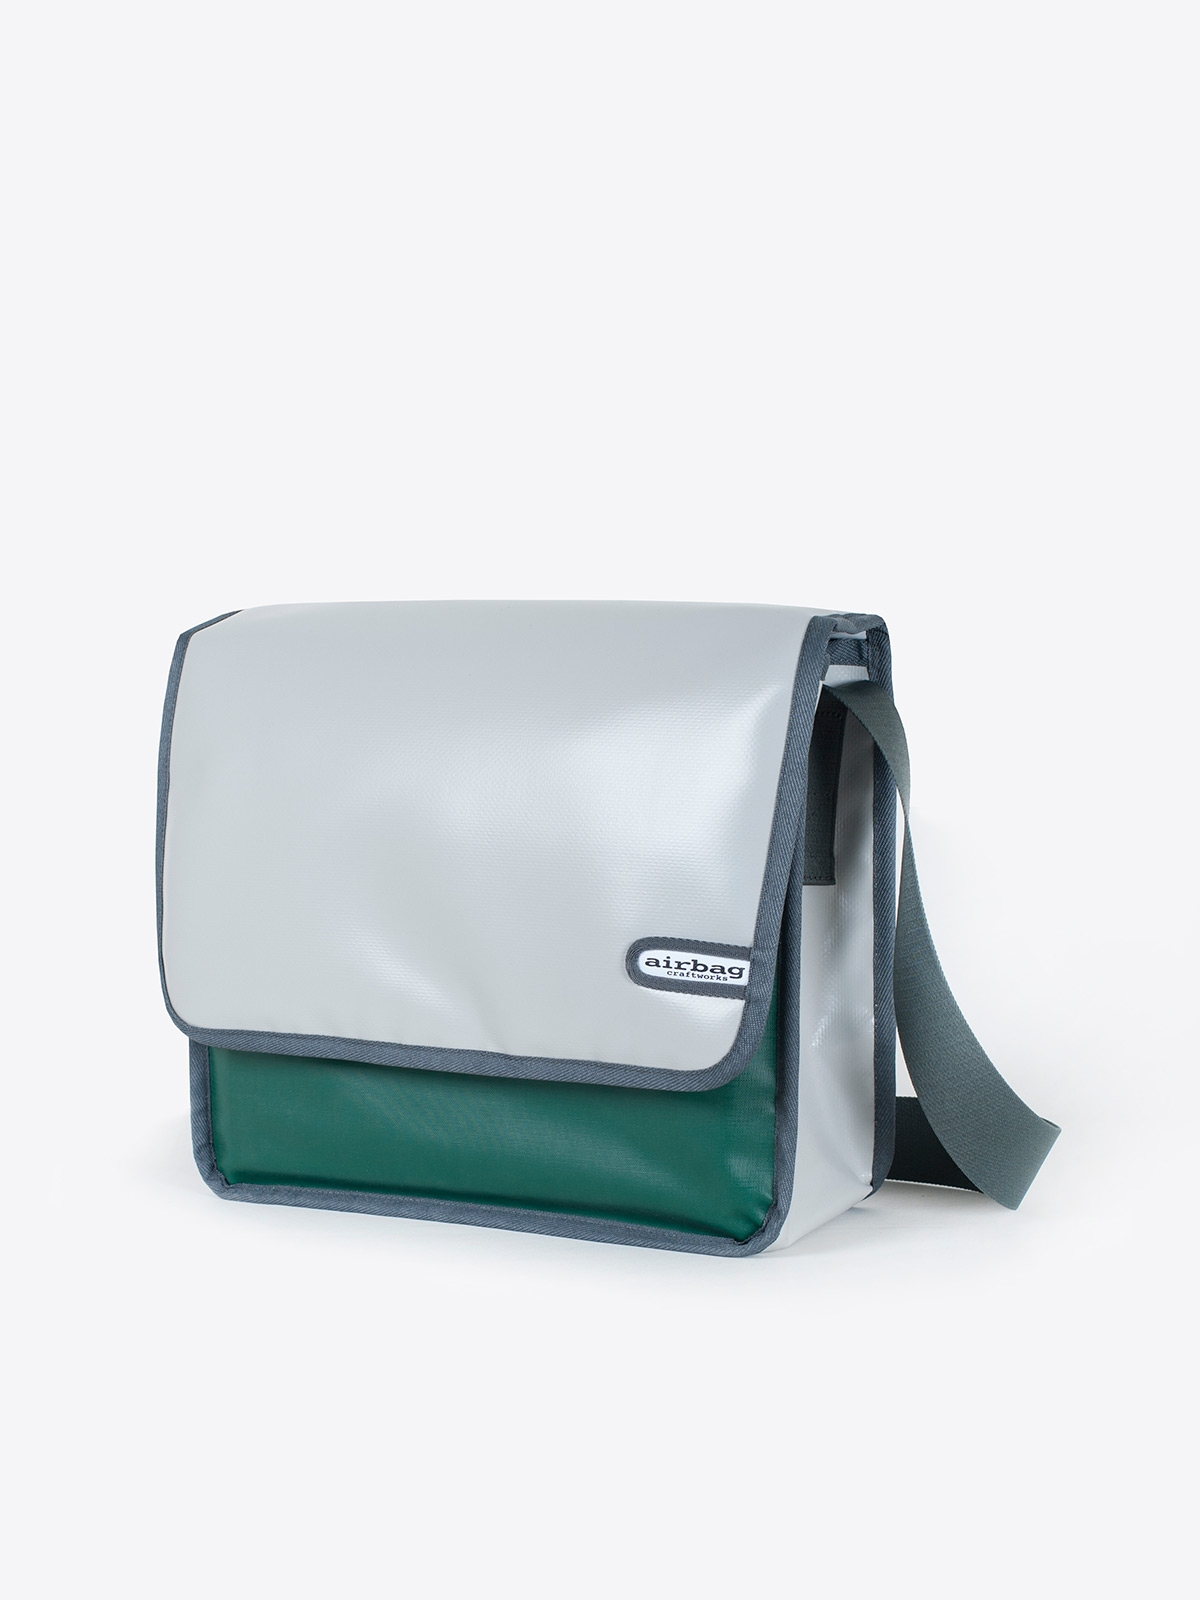 airbag craftworks 639